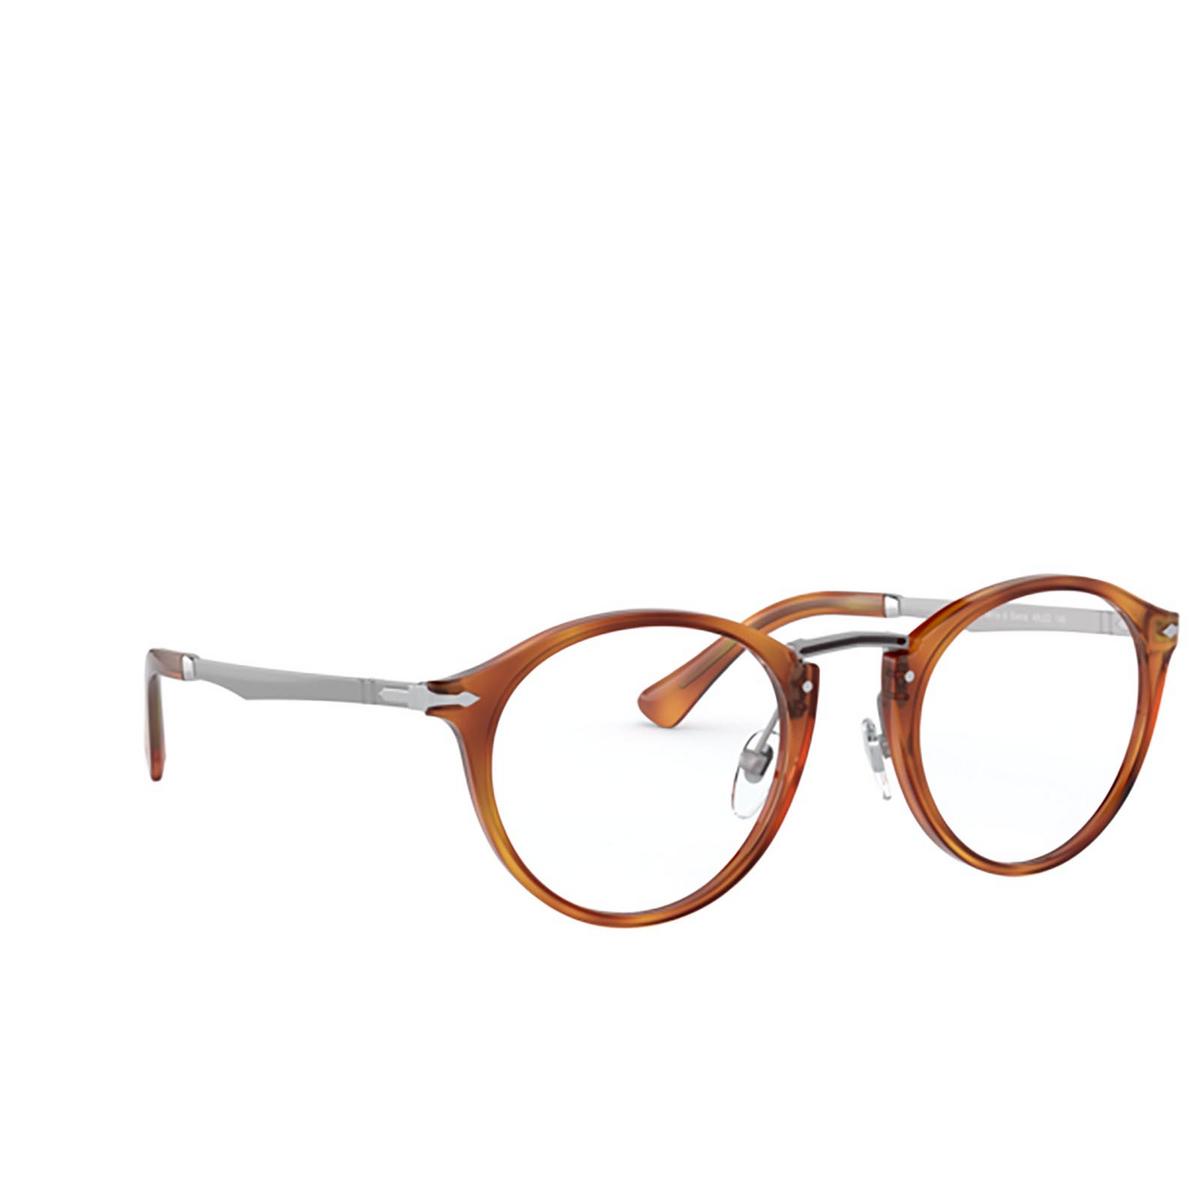 Persol® Round Eyeglasses: PO3248V color Terra Di Siena 96 - three-quarters view.